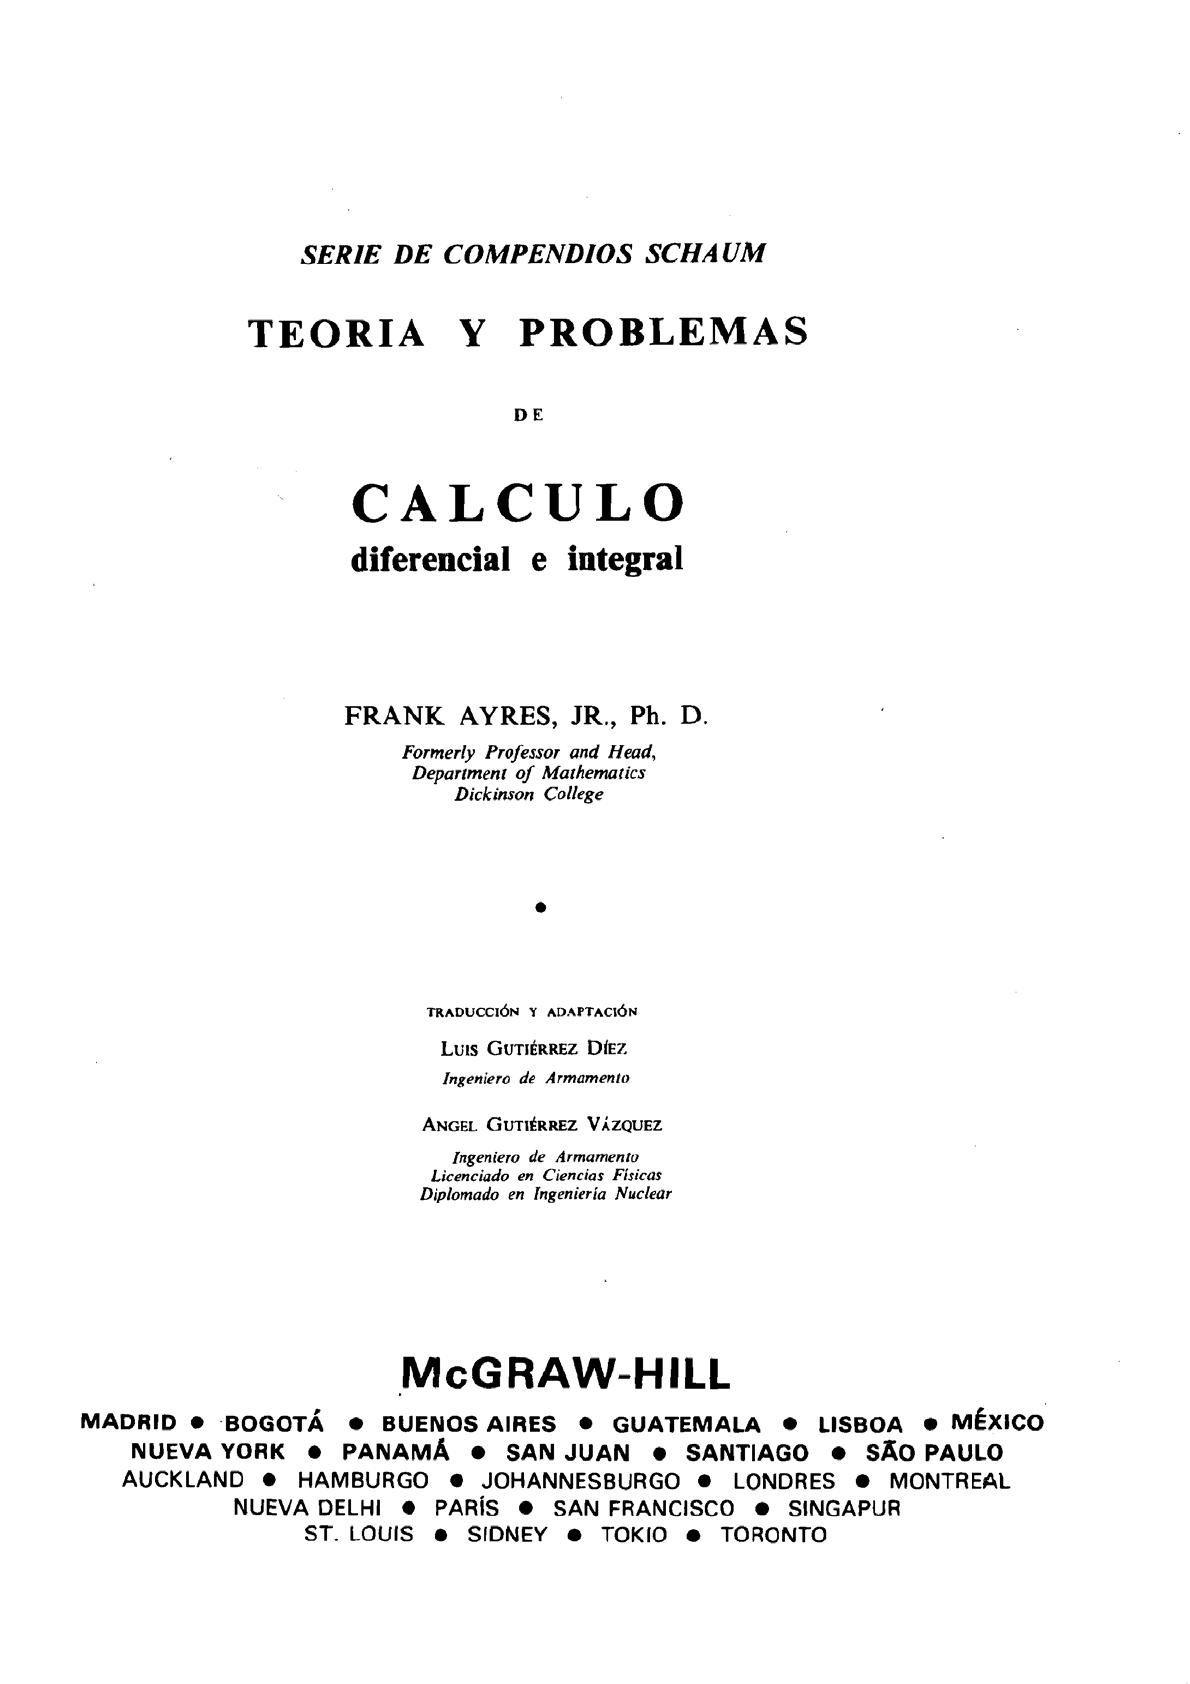 calculo diferencial e integral frank ayres serie schaum pdf